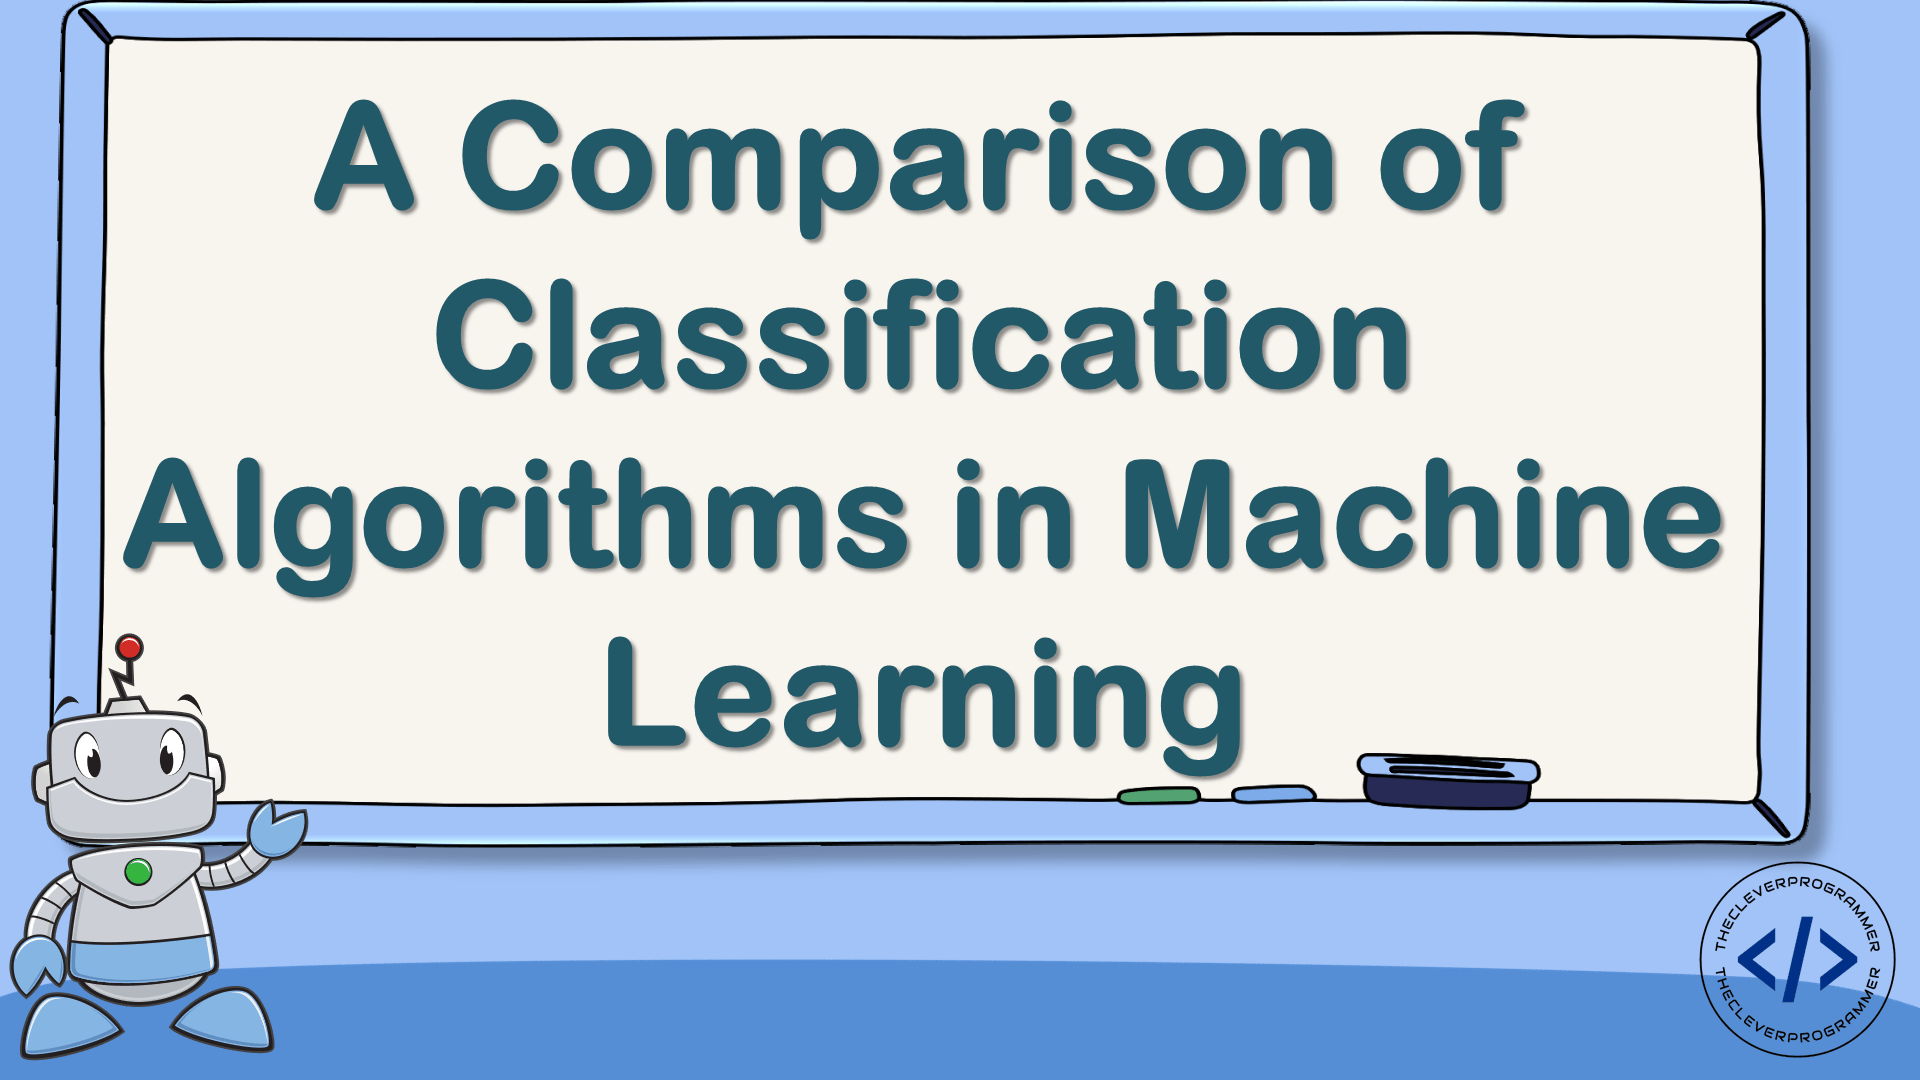 Comparison of Classification Algorithms in Machine Learning